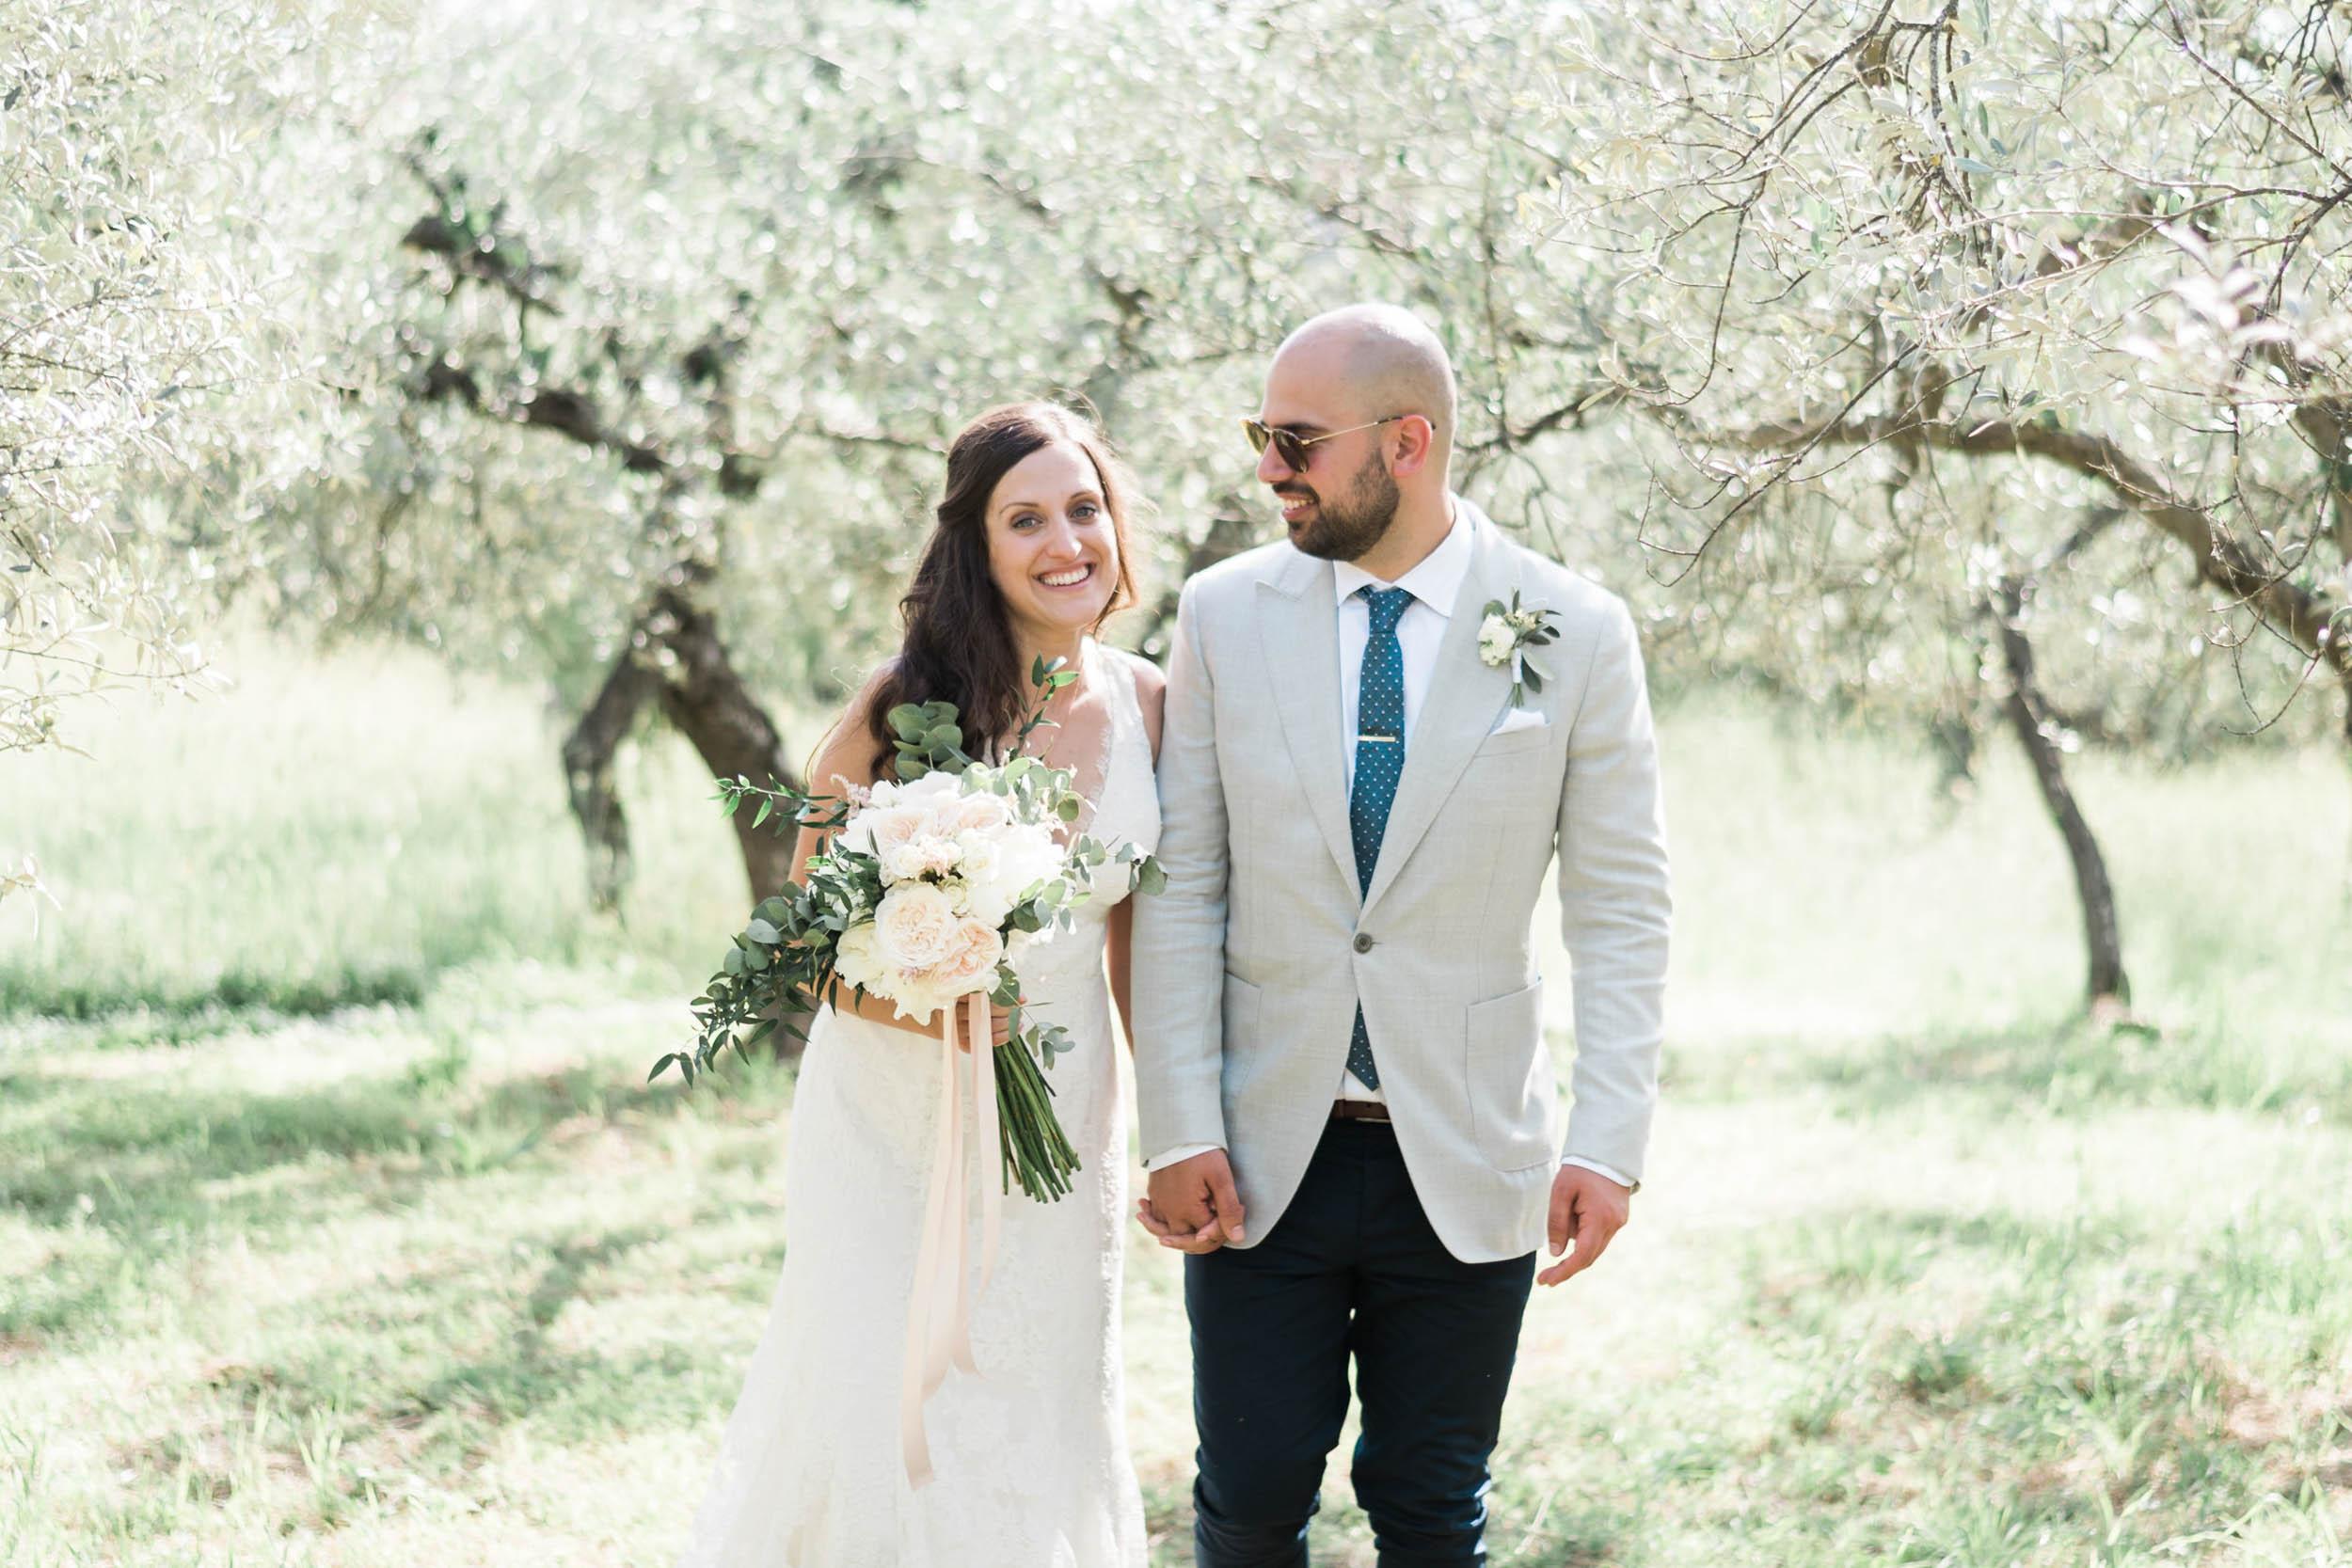 Emma & Peter - Elopment . Spoleto, Italy